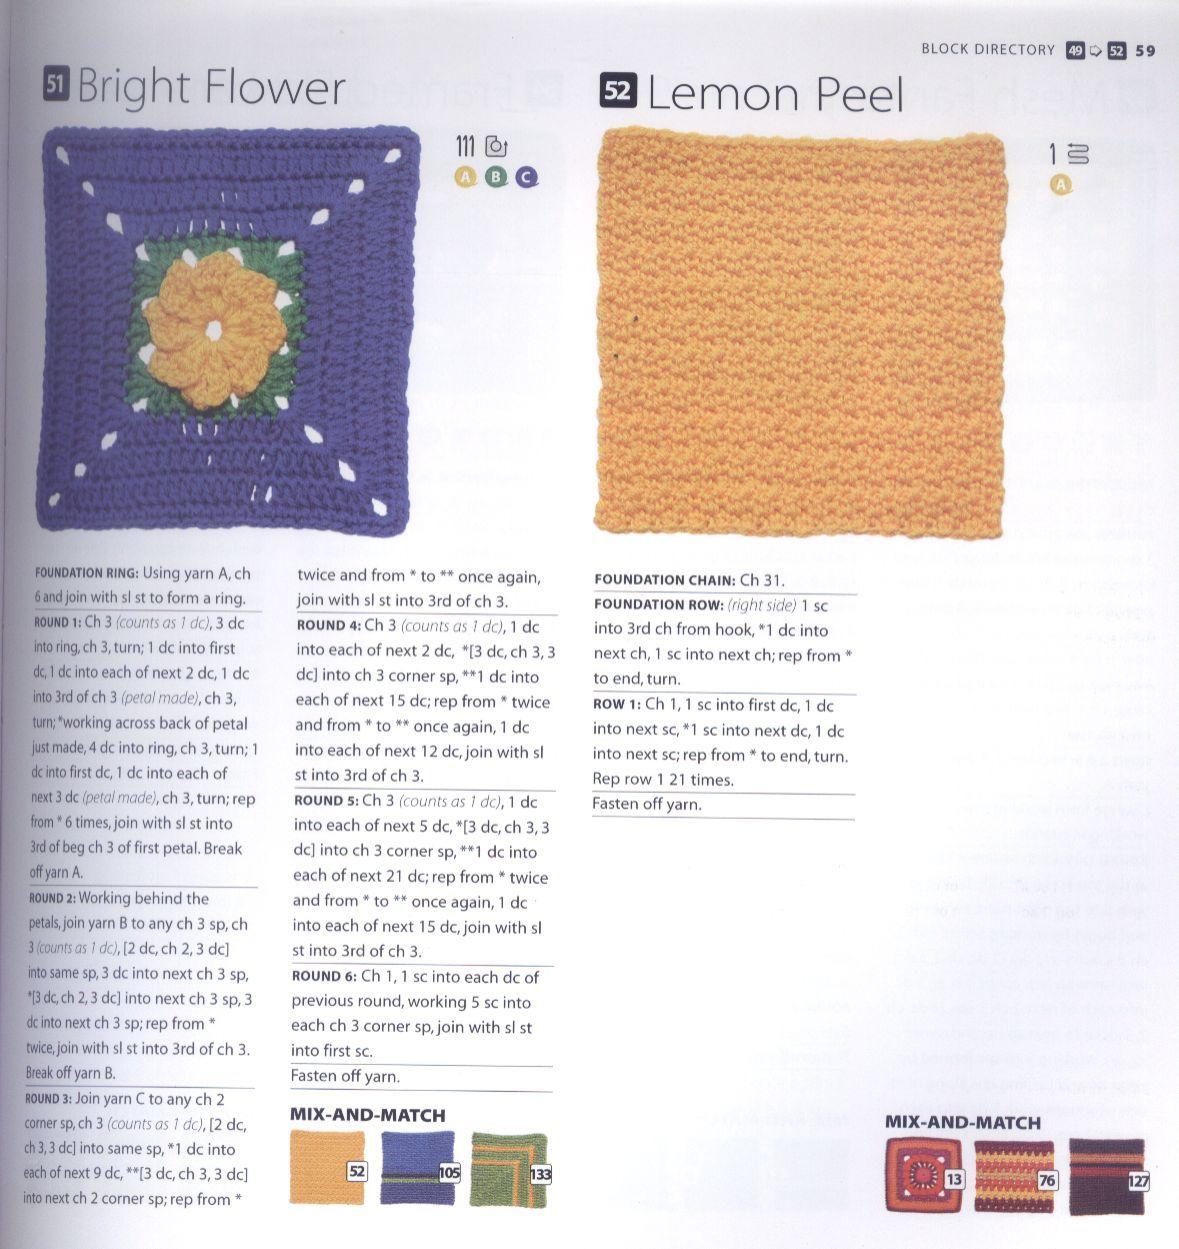 200 Crocheted Blocks for blankets, throws & Afghans 059